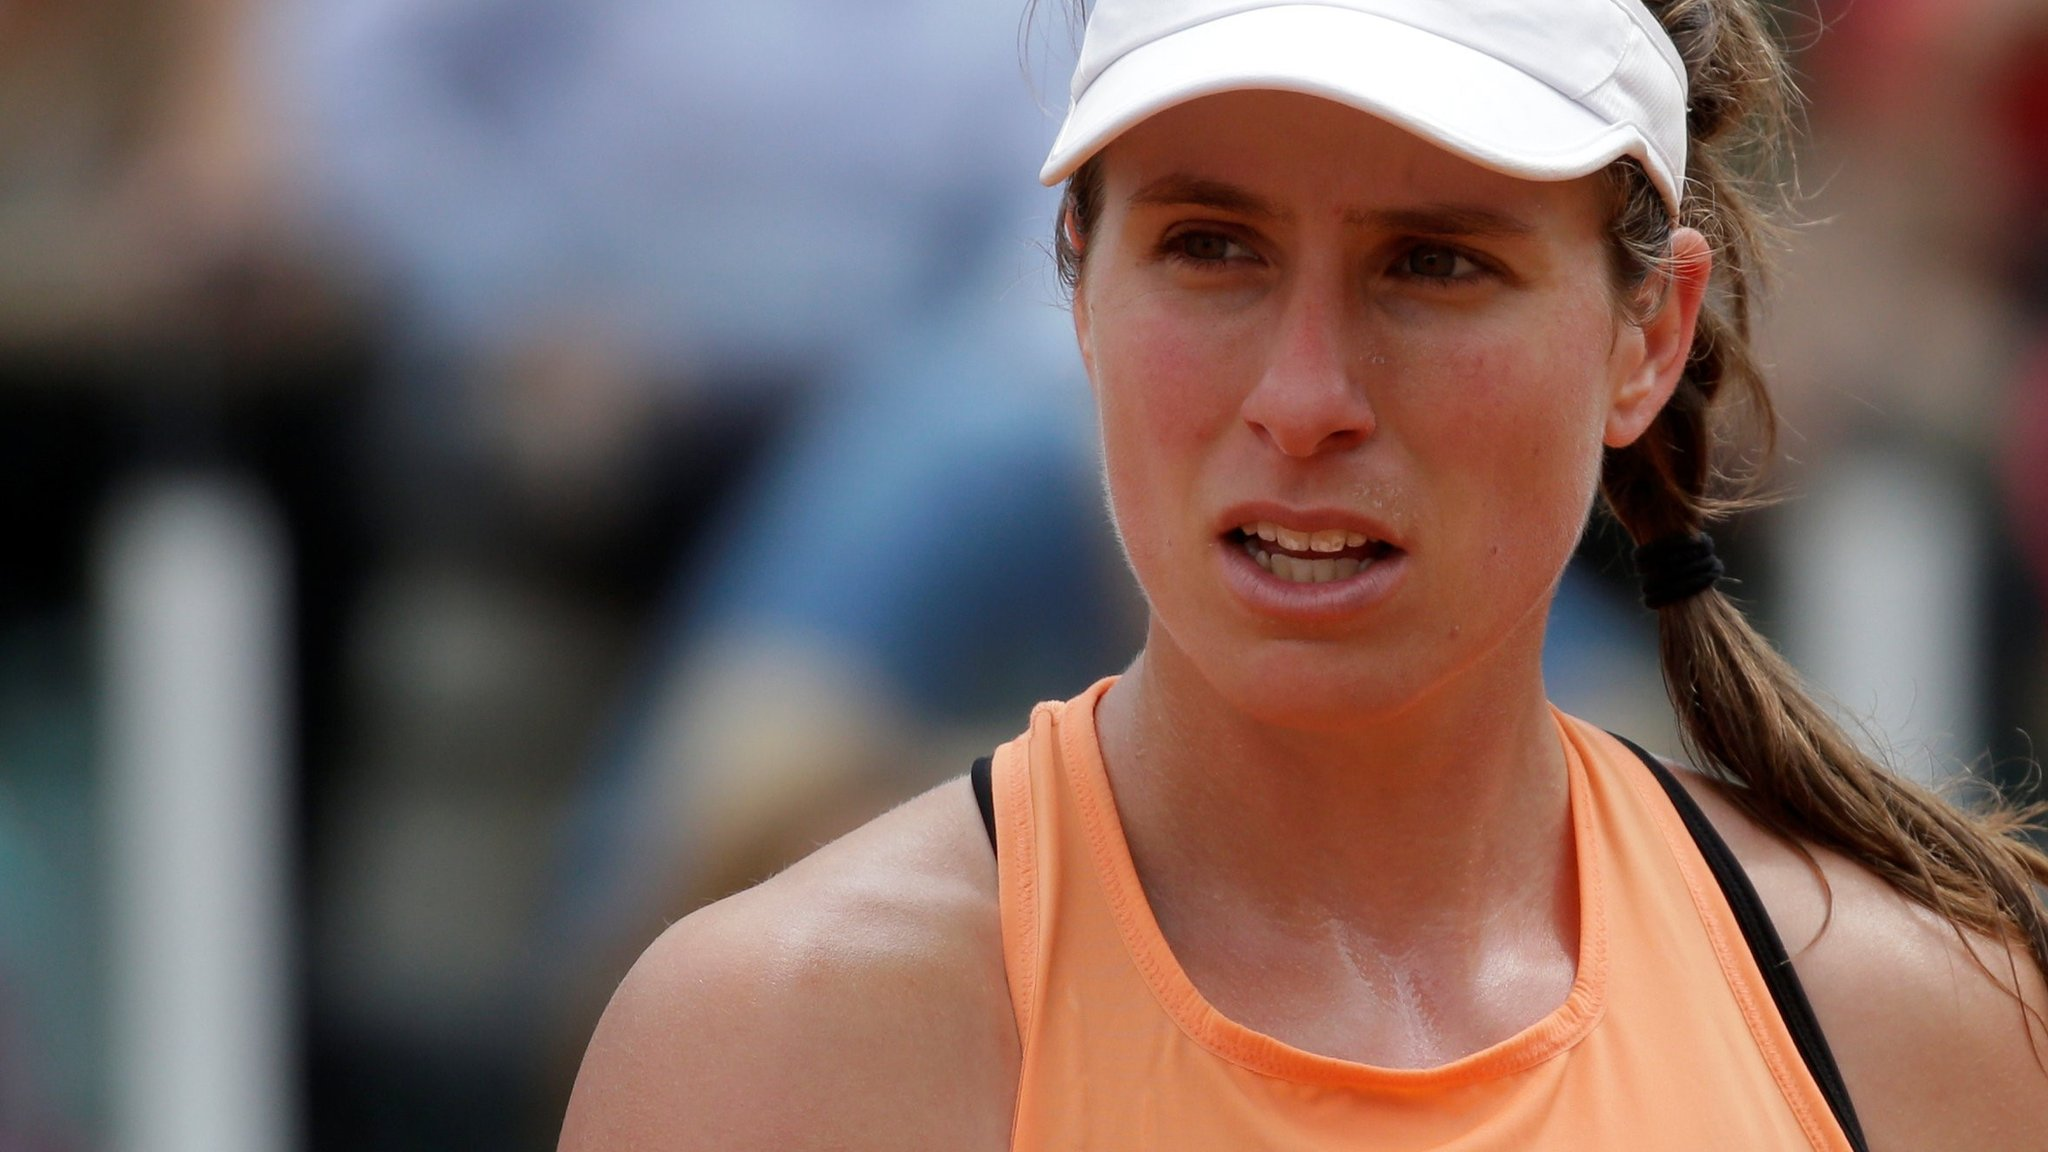 Italian Open: Johanna Konta loses to Jelena Ostapenko in Rome